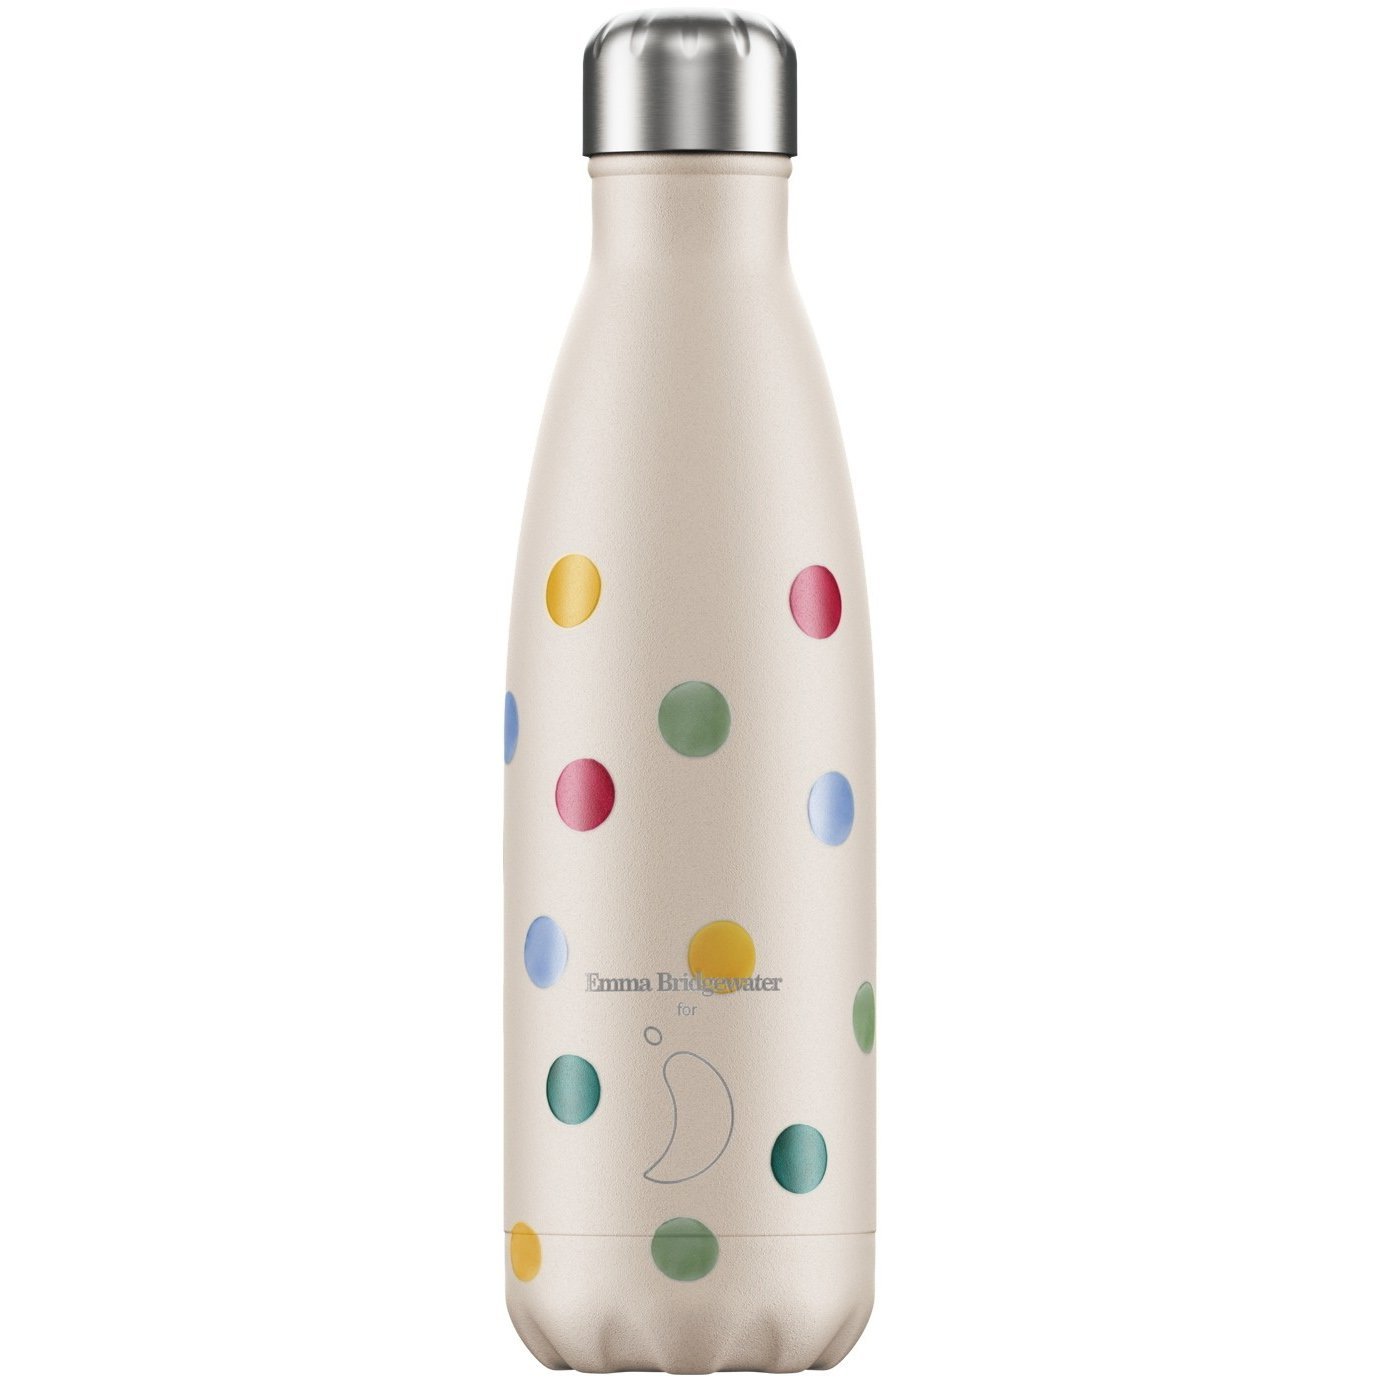 Chilly's Bottle Polka Dot Ανοξείδωτο Θερμός με Πουά Σχέδιο 260ml